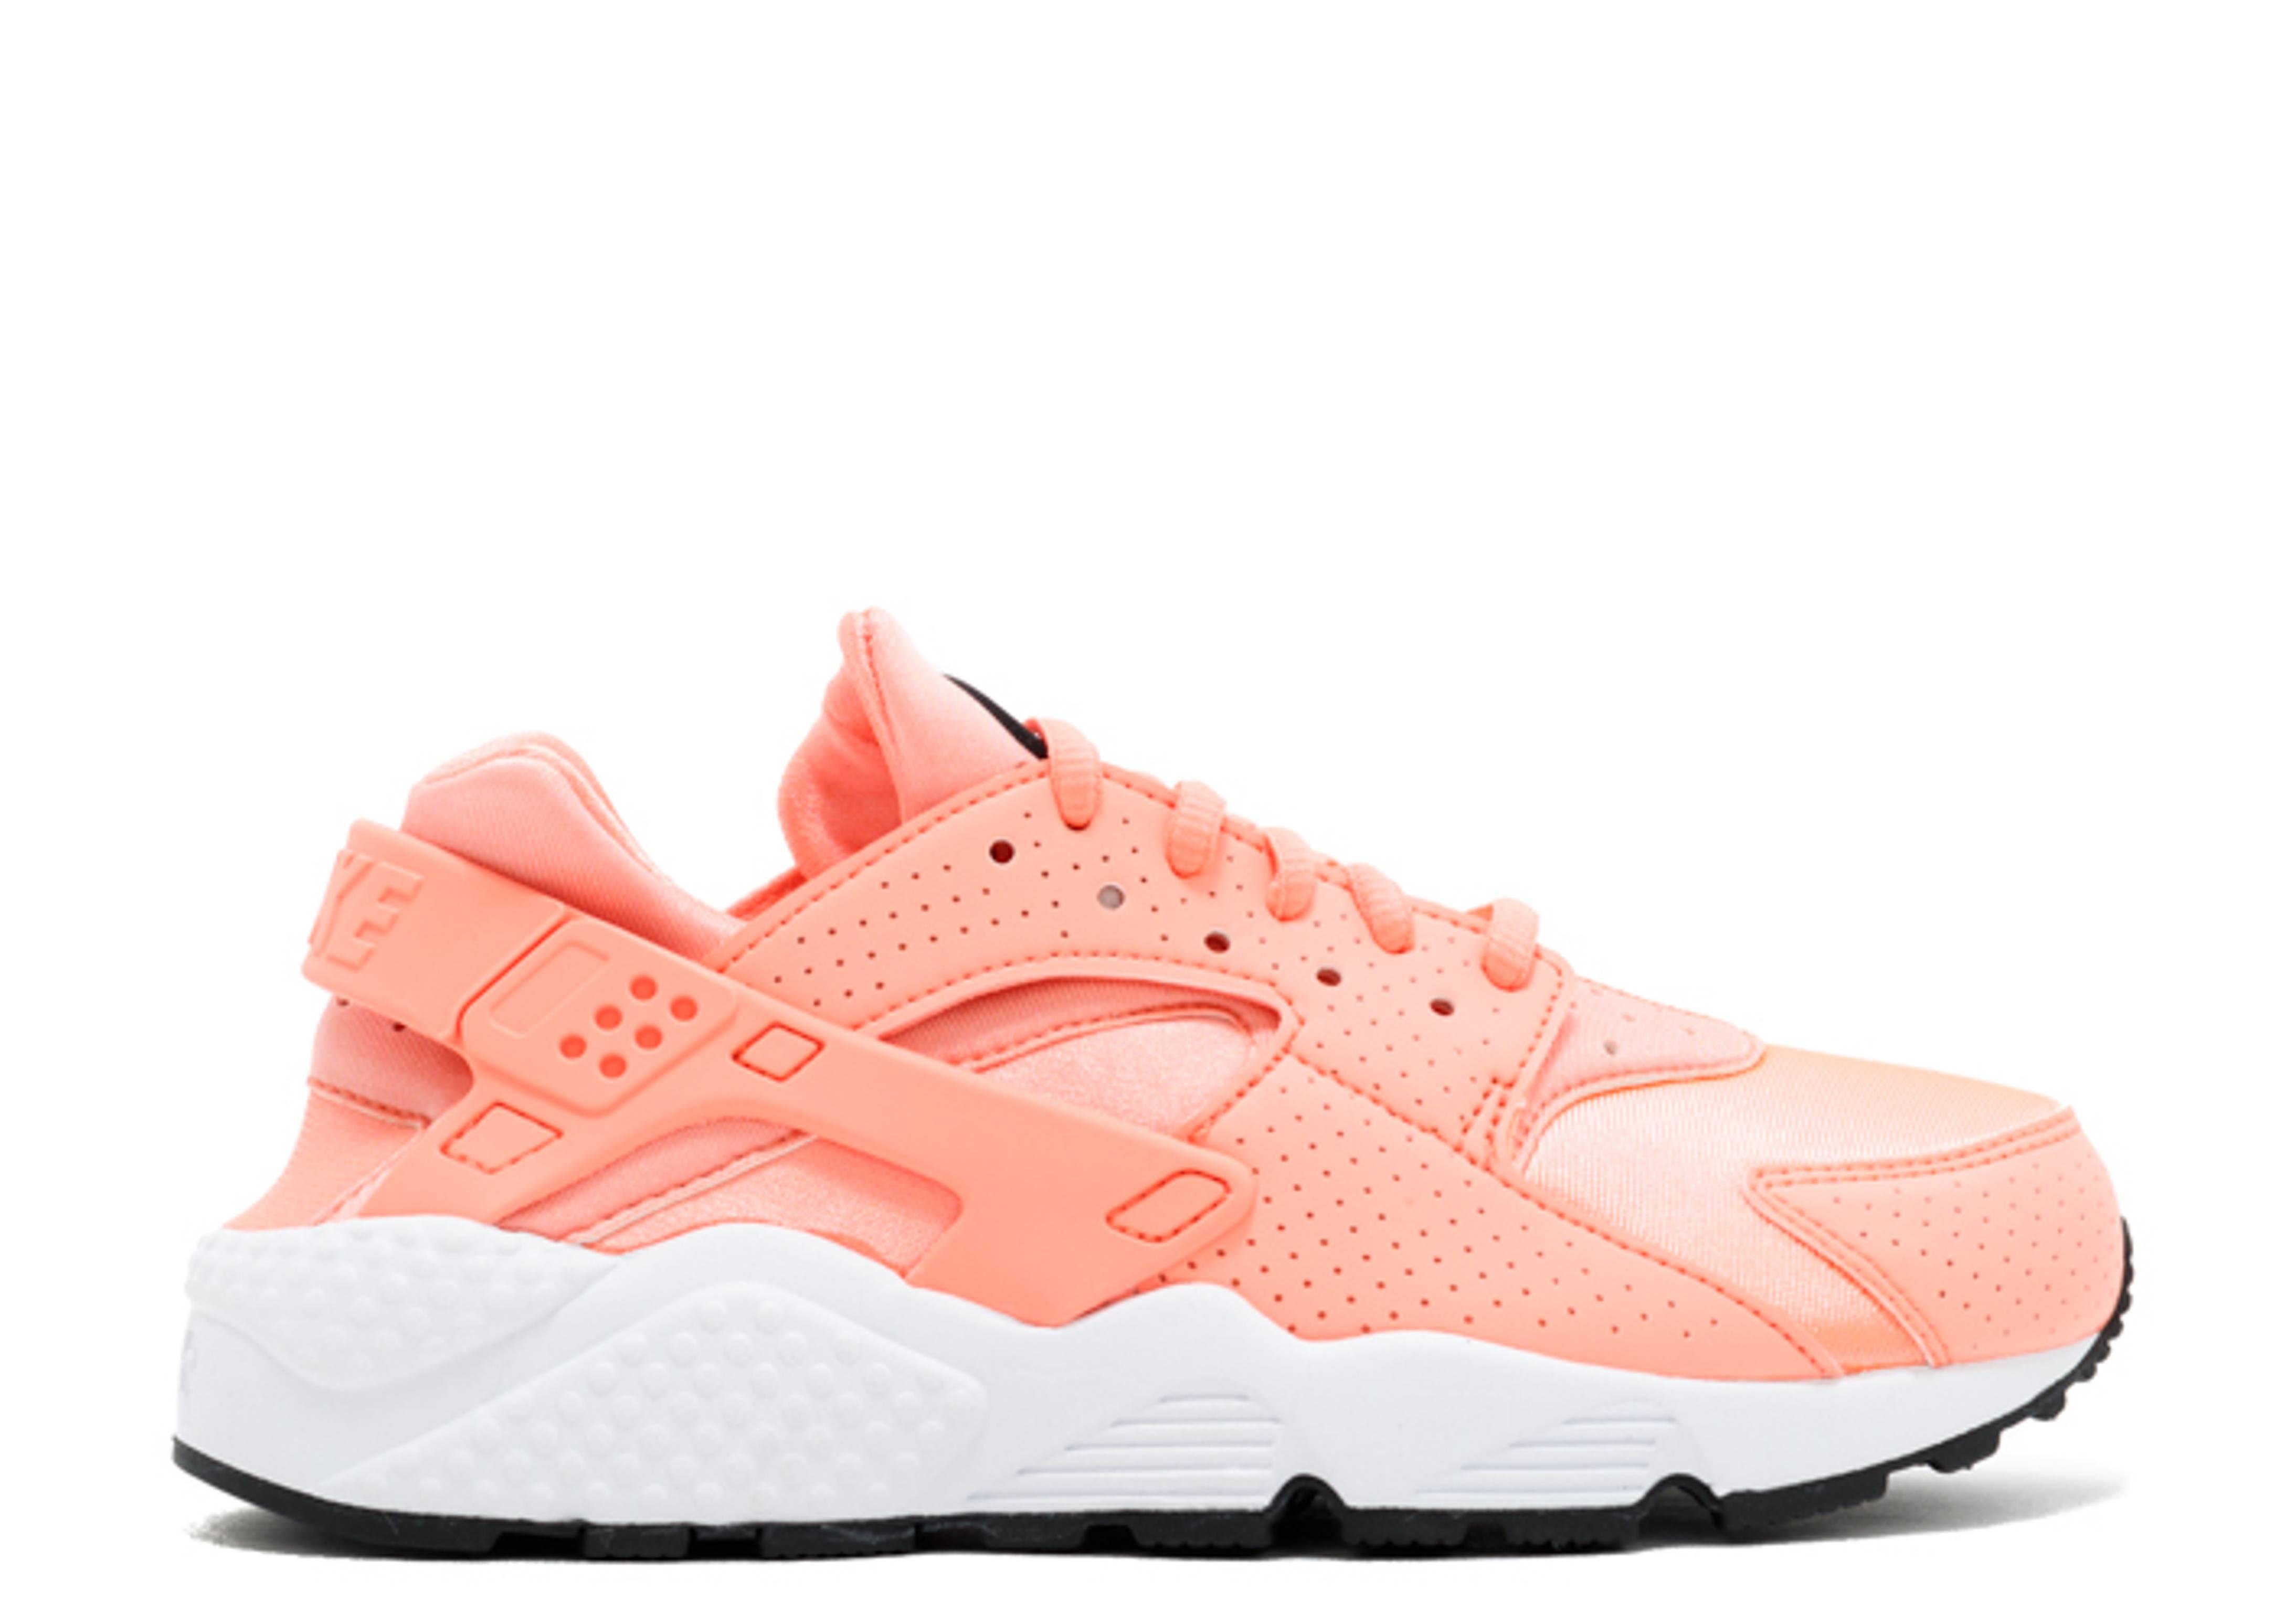 Huarache Nike Pink Grey